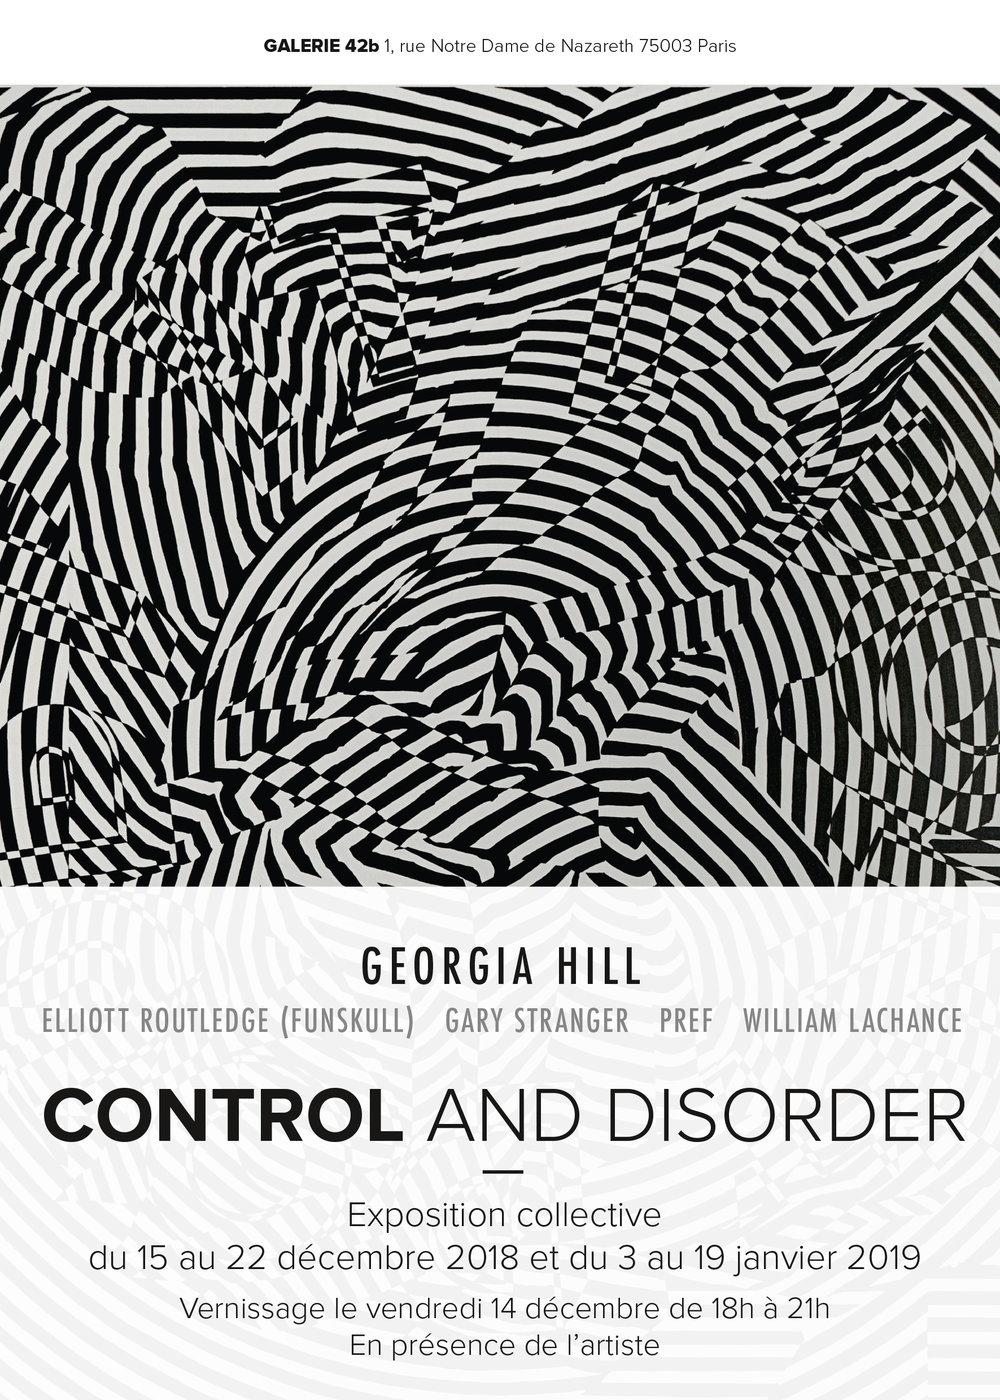 1812_G42b_control_Hill.jpg